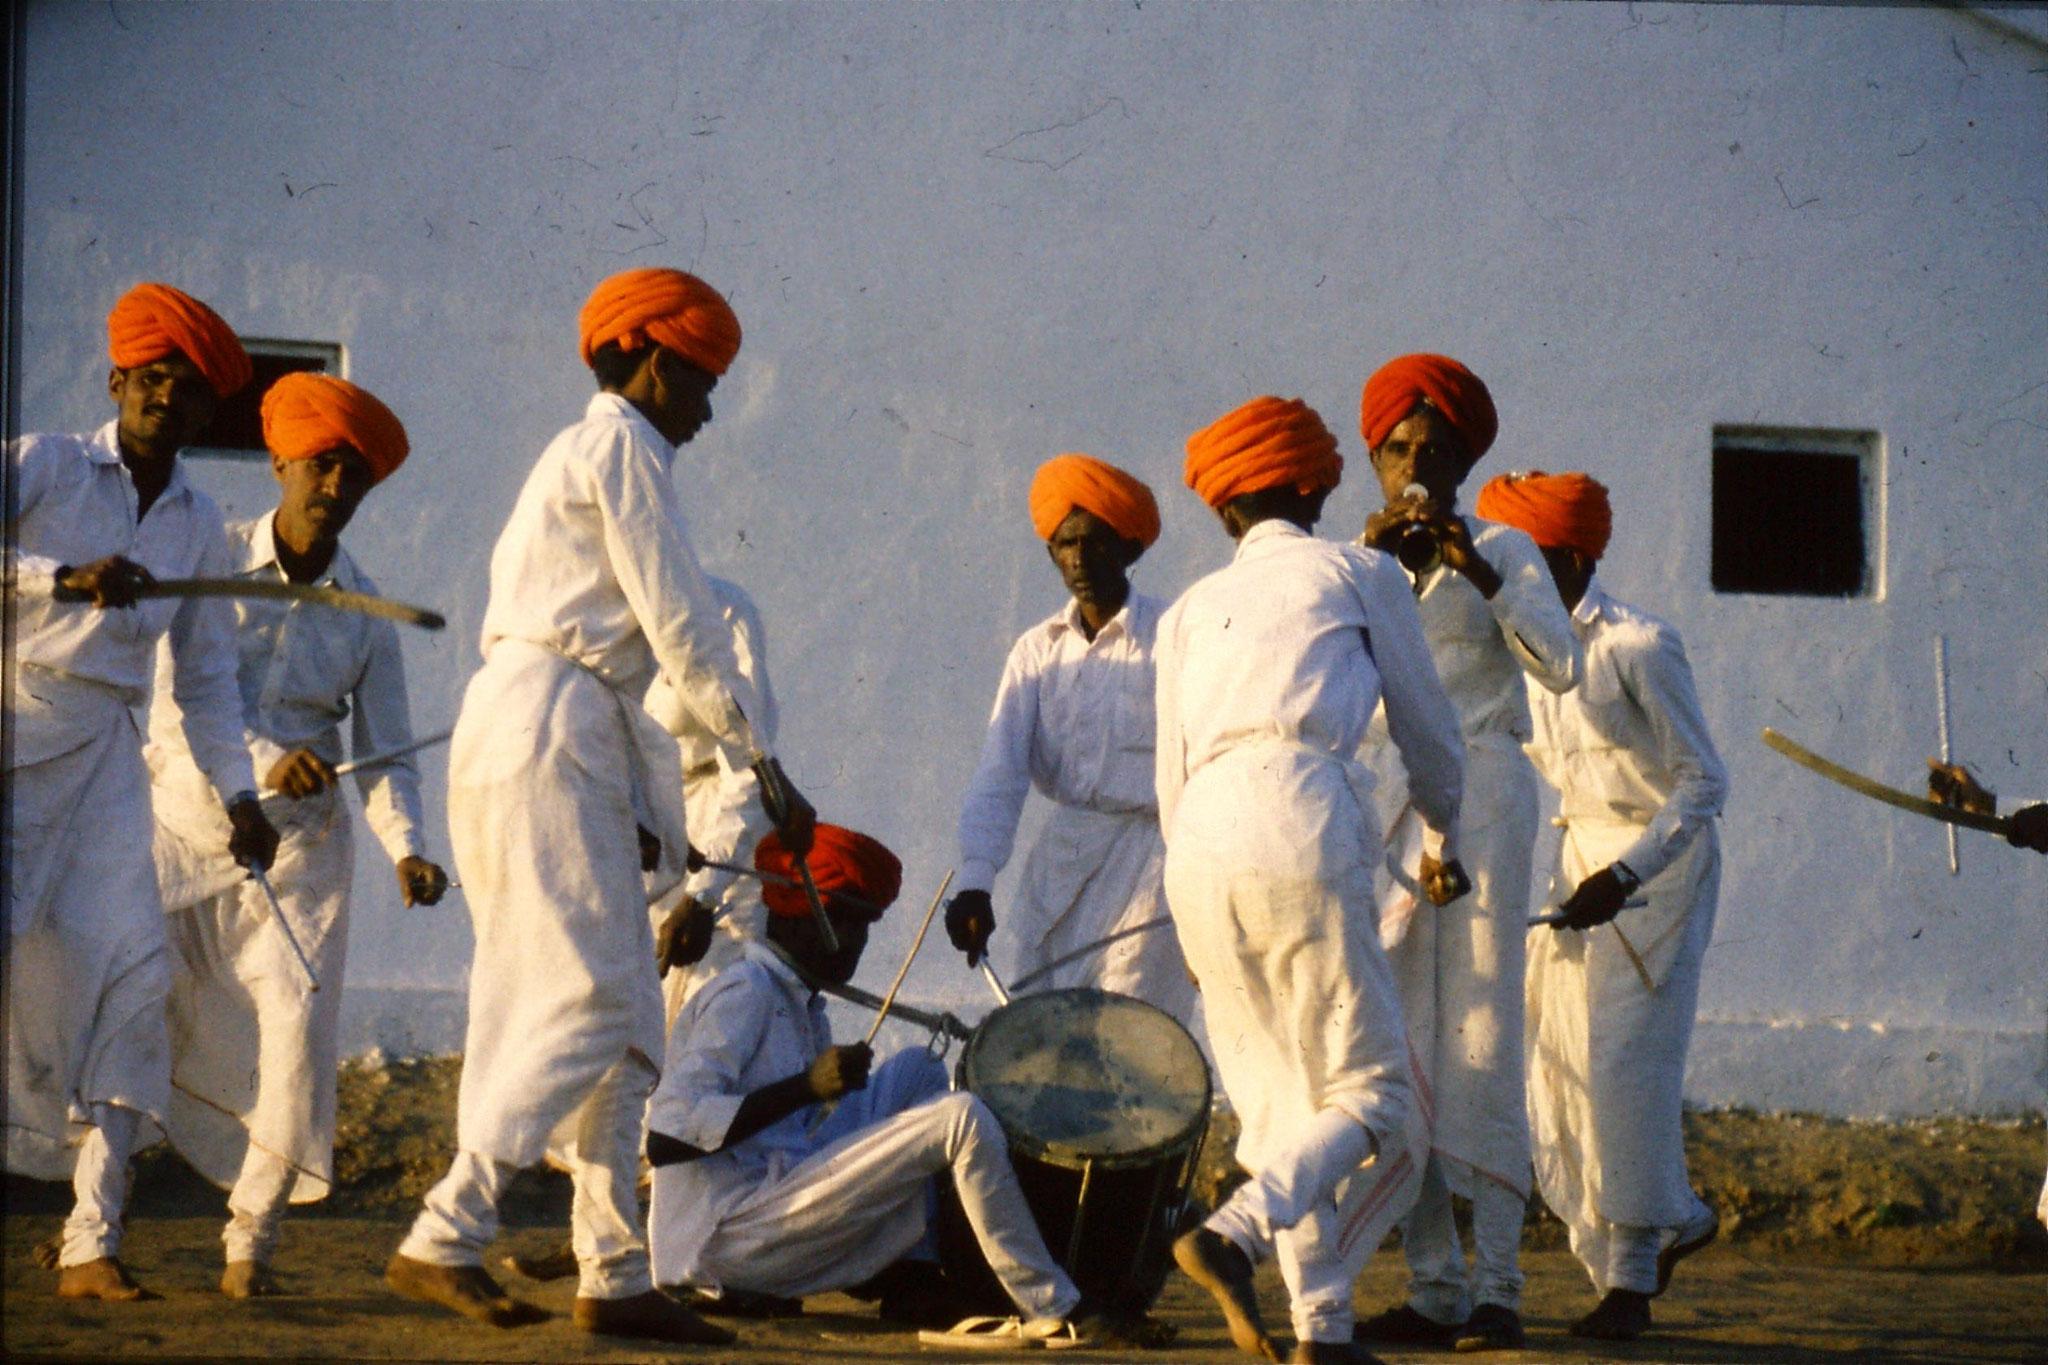 8/12/1989: 28: Udaipur Shilp Gram Craft Centre dancing